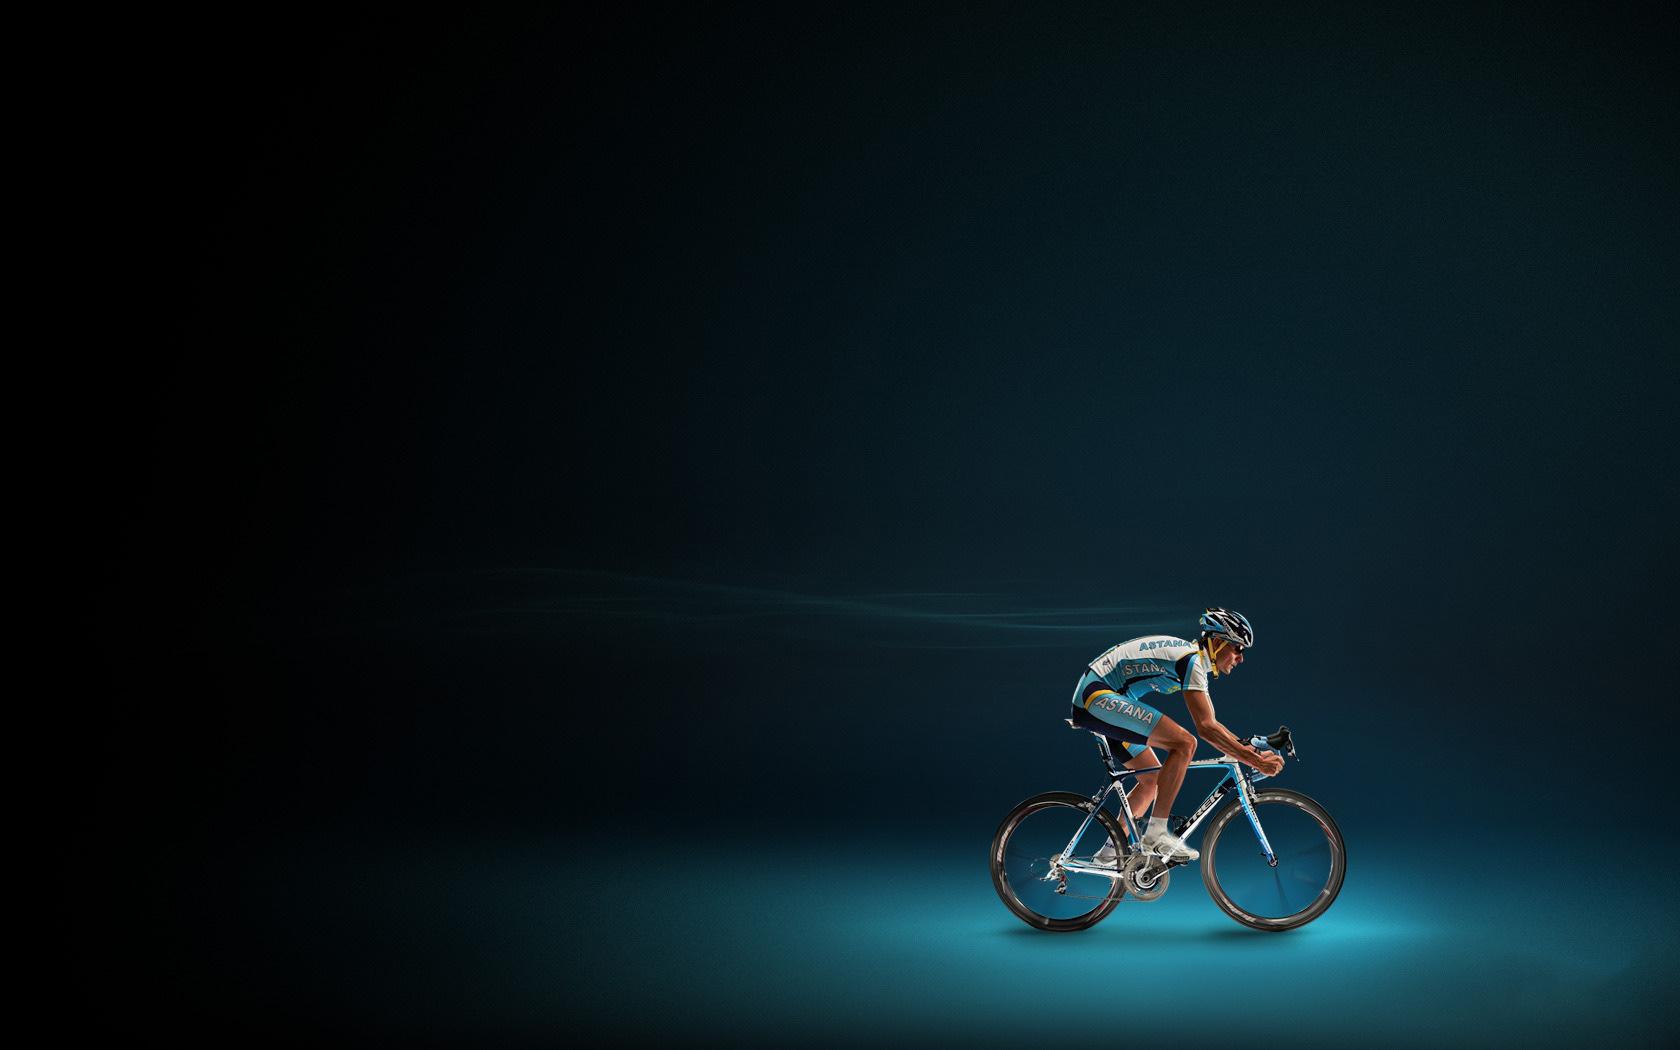 Cycling Wallpaper Downloads Wallpapersafari